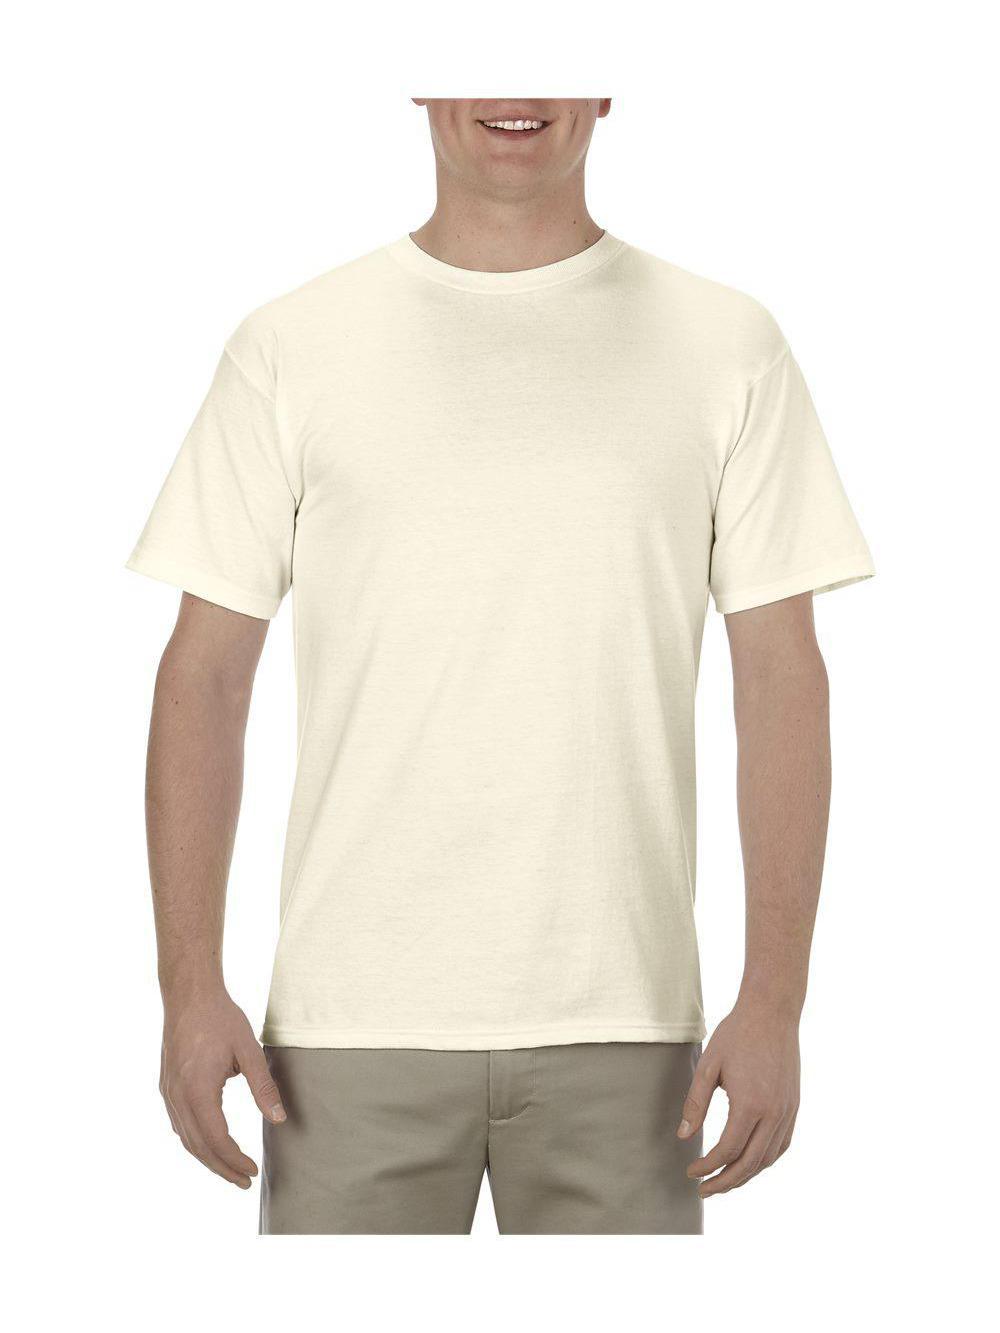 ALSTYLE-Premium-T-Shirt-1701 thumbnail 30